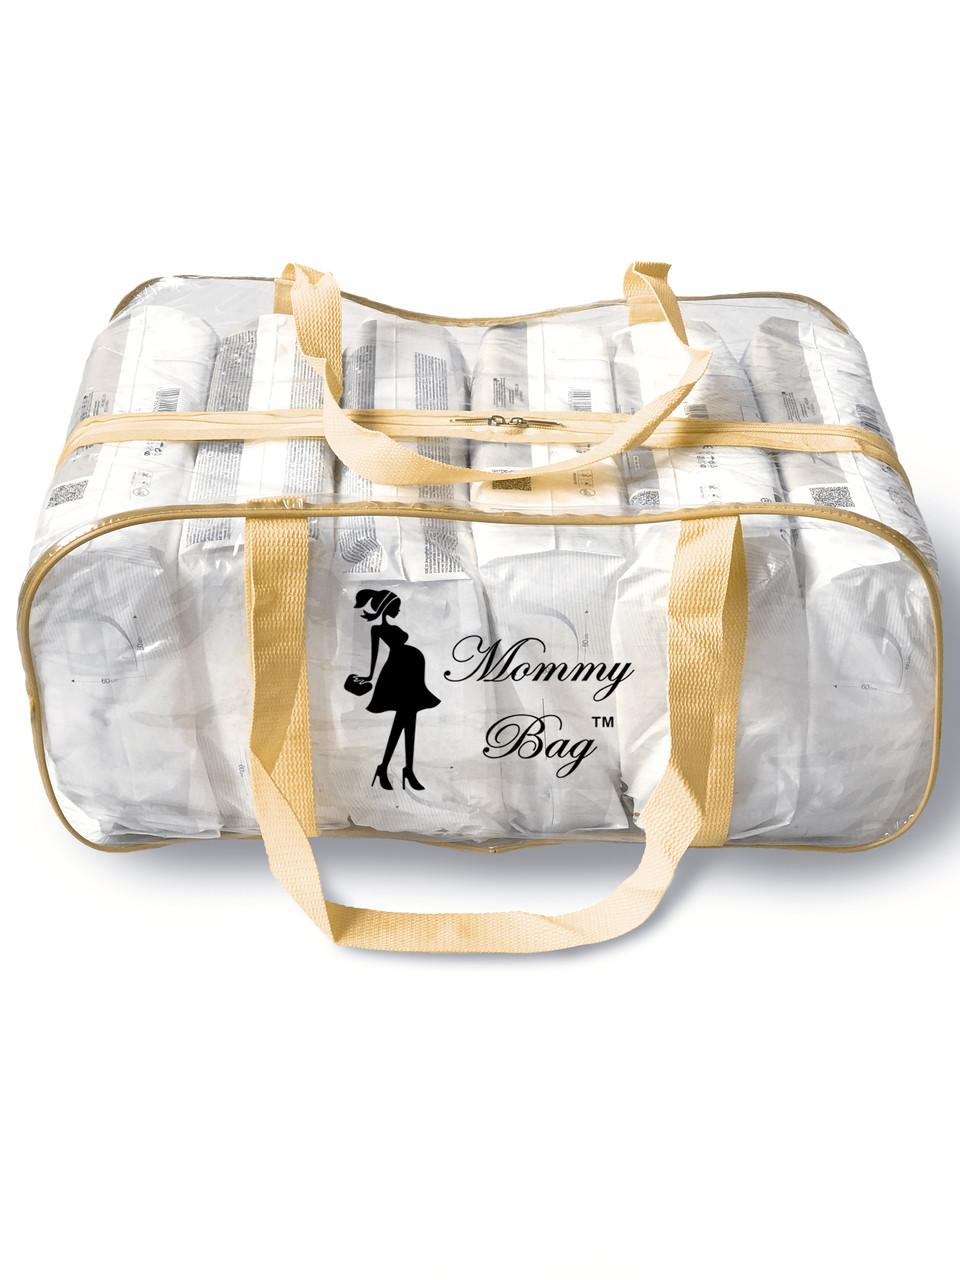 Сумка прозрачная в роддом Mommy Bag - L - 50*23*32 см Бежевая